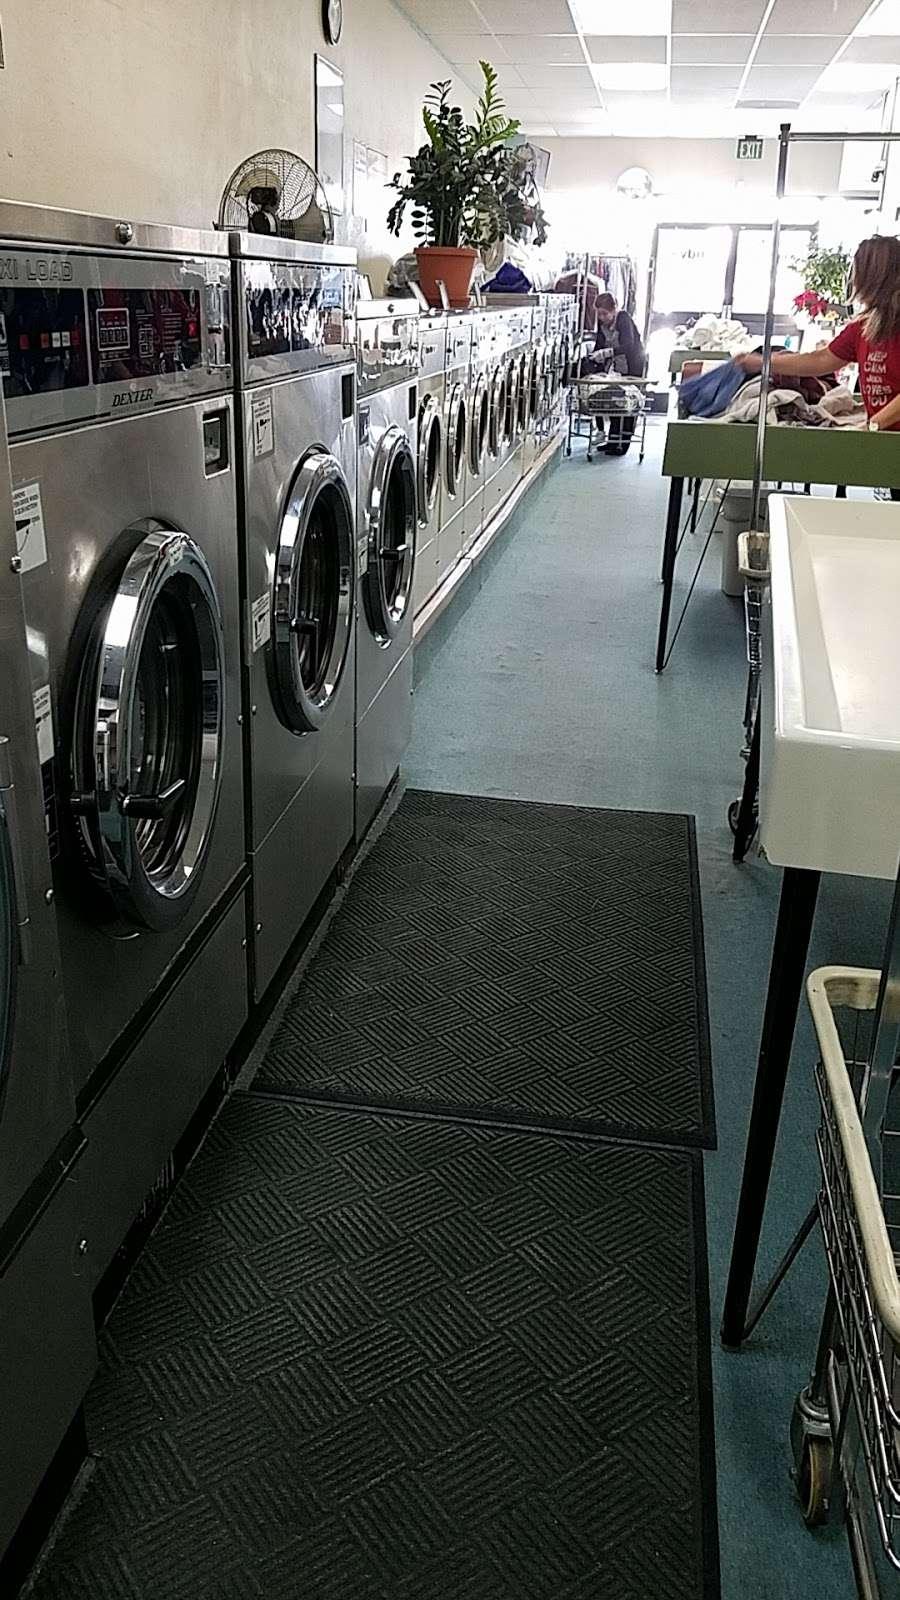 Andys Laundry - laundry  | Photo 3 of 4 | Address: 3871 E 120th Ave, Denver, CO 80233, USA | Phone: (303) 451-8454